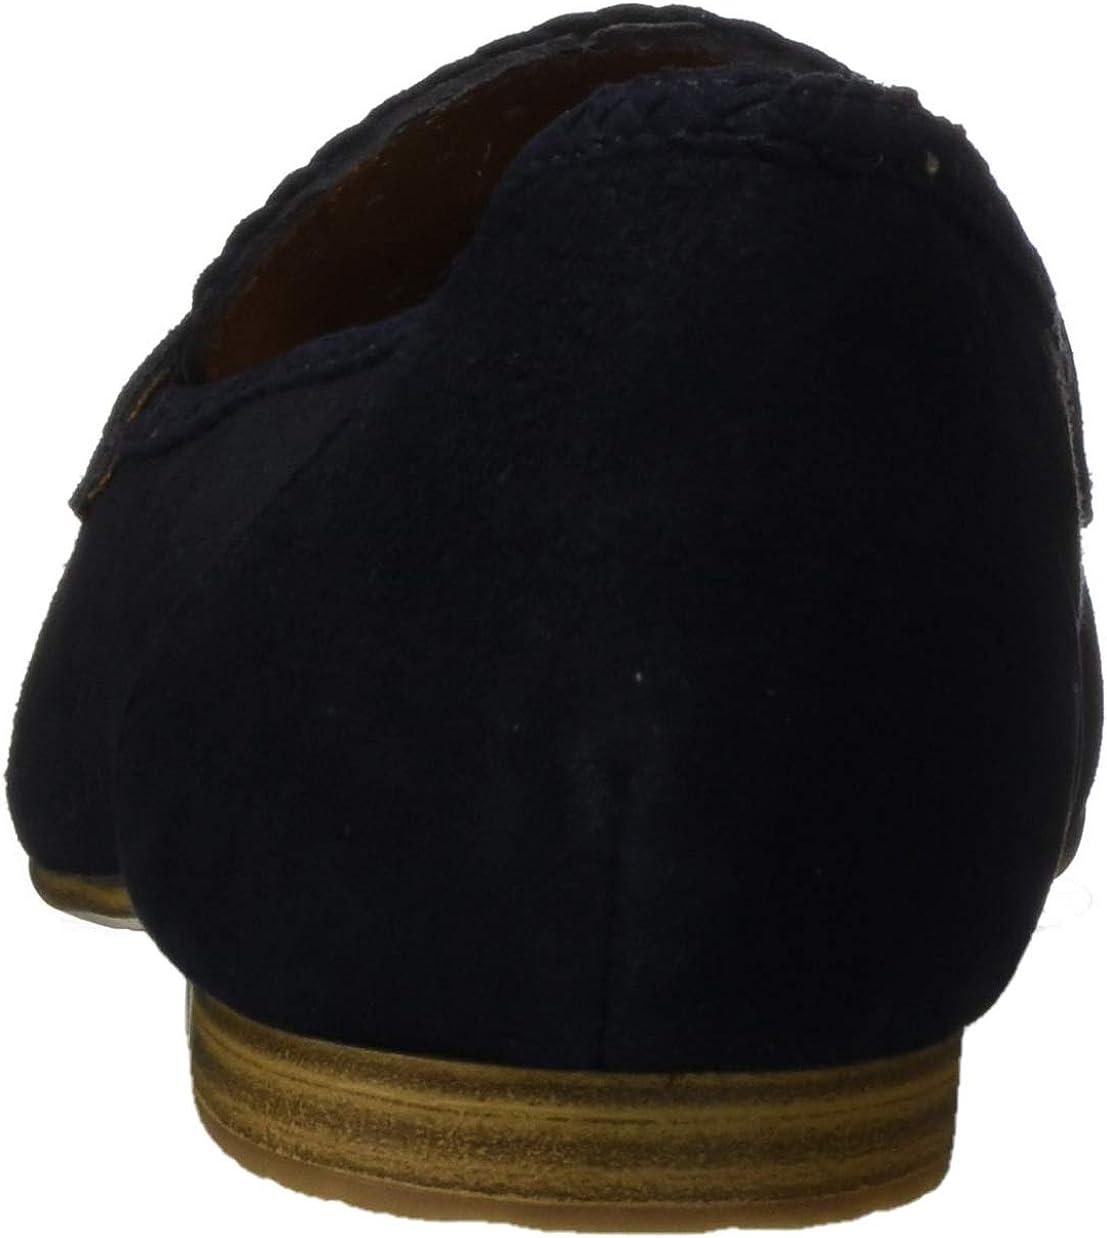 Tamaris 1-1-24232-24, Mocassin Femme Bleu Marine 805